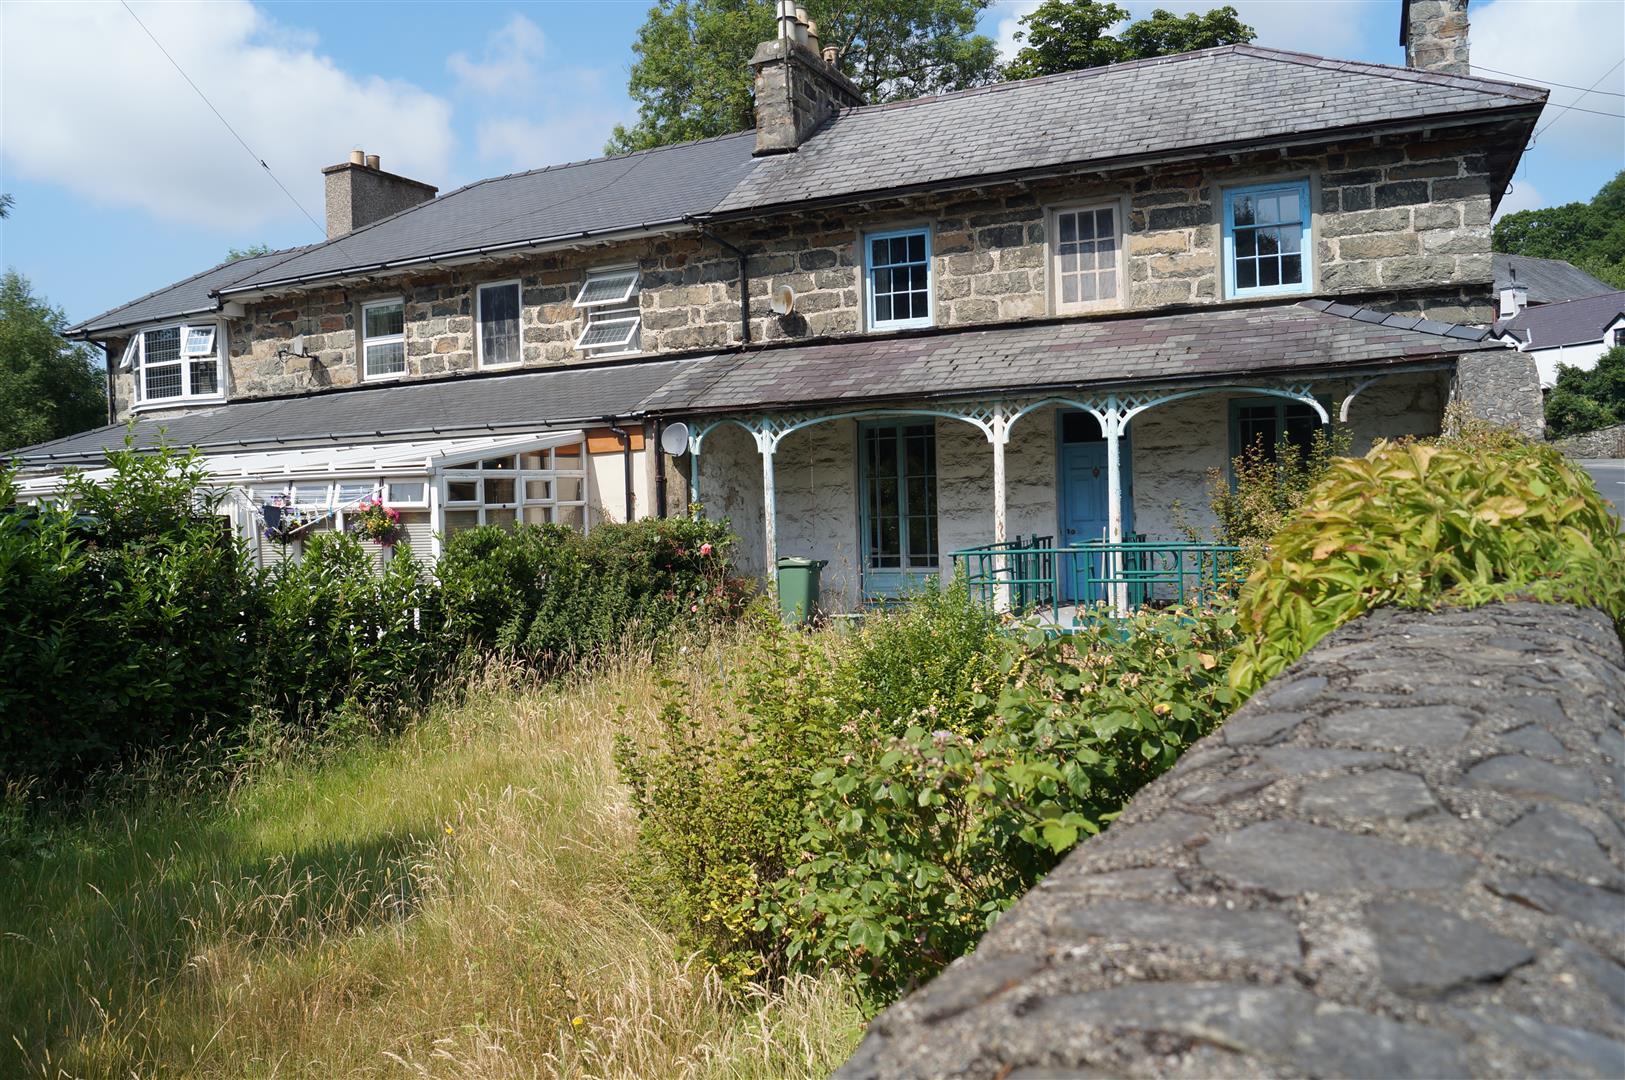 Penmorfa, Porthmadog - £200,000/Offers over